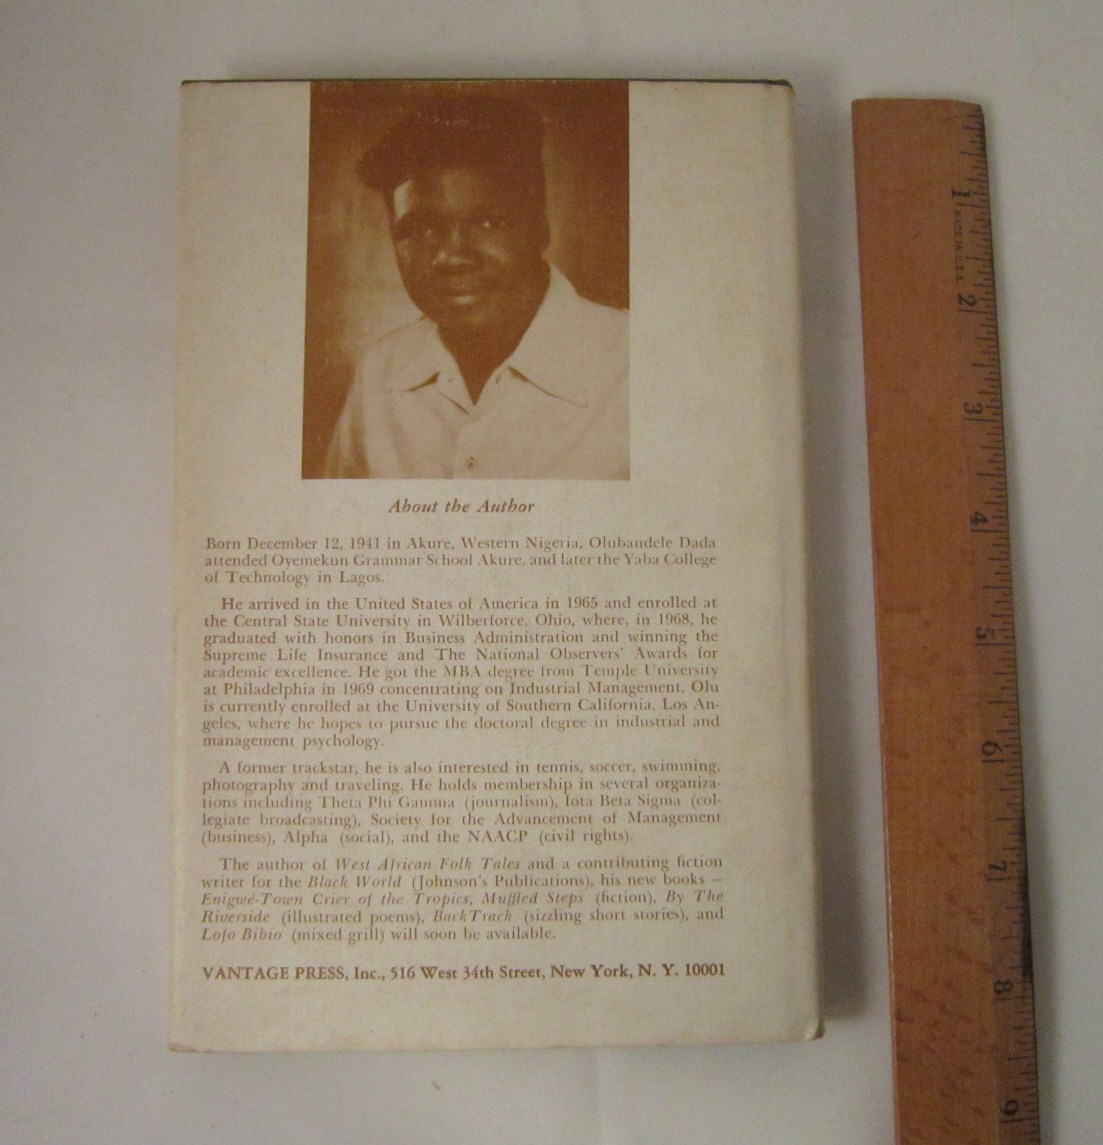 Poems of Penetration 1971 by Olubandele Dada from Nigeria, Hardback